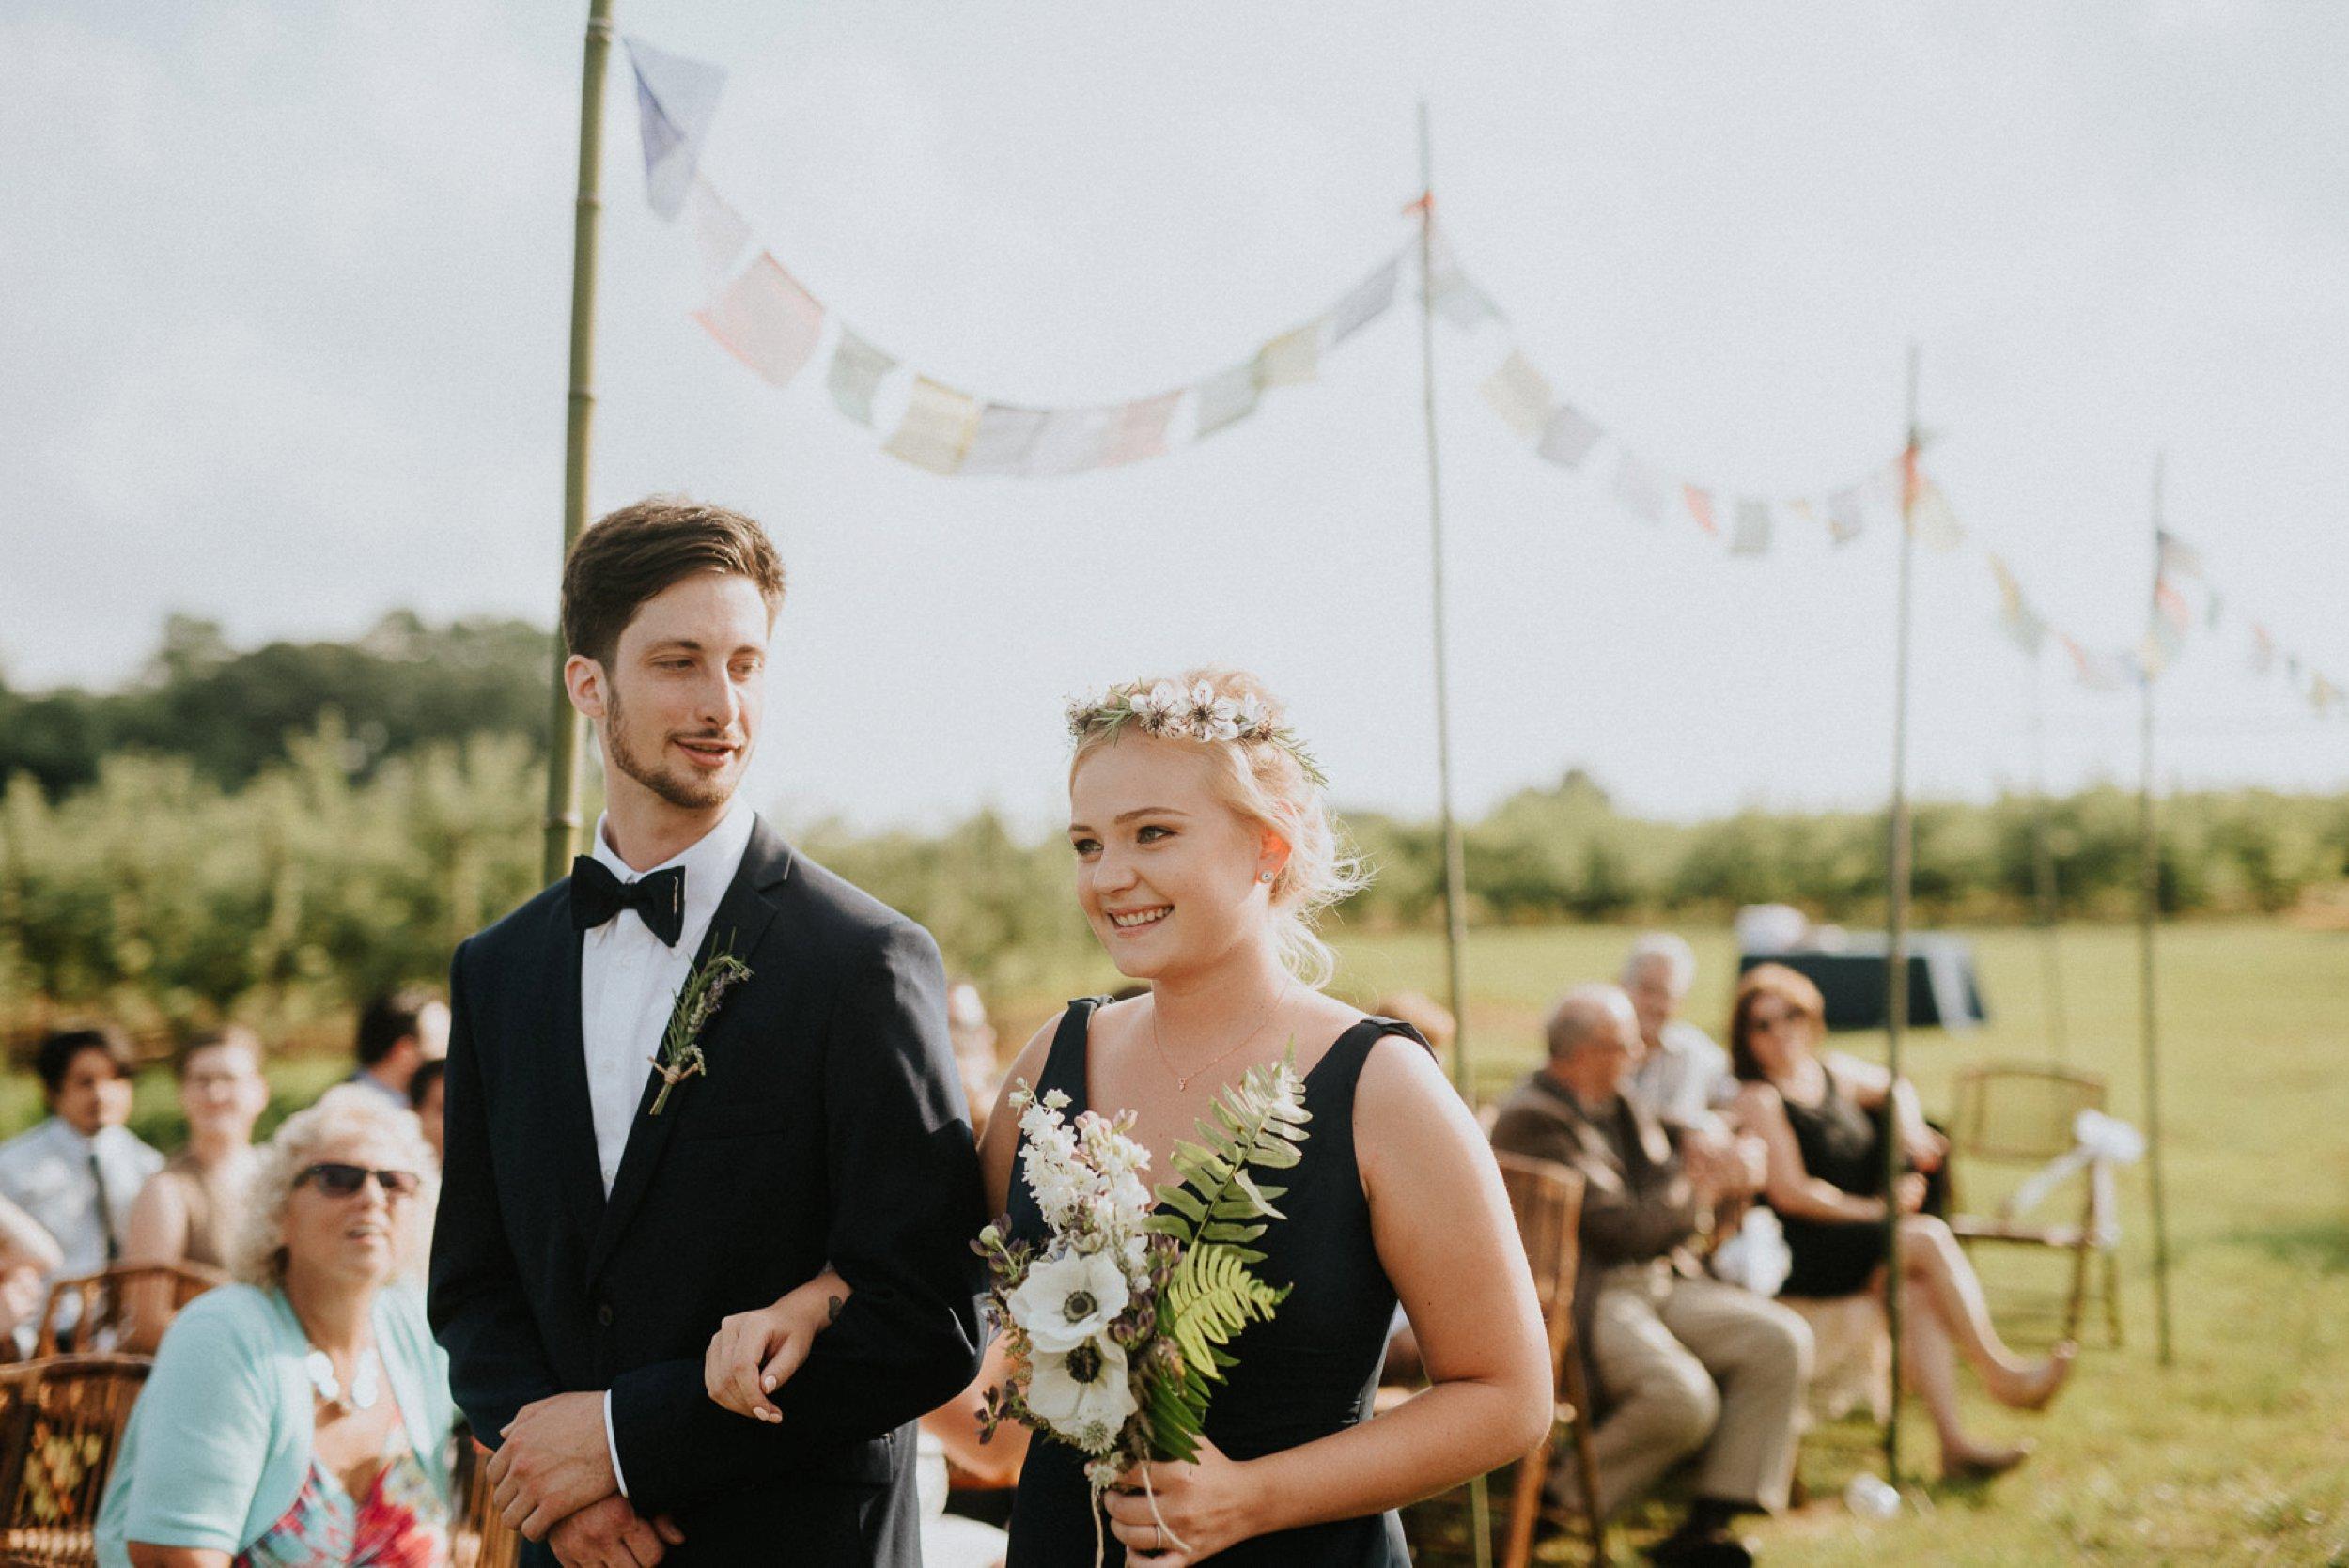 milburn_farms-wedding-30.jpg